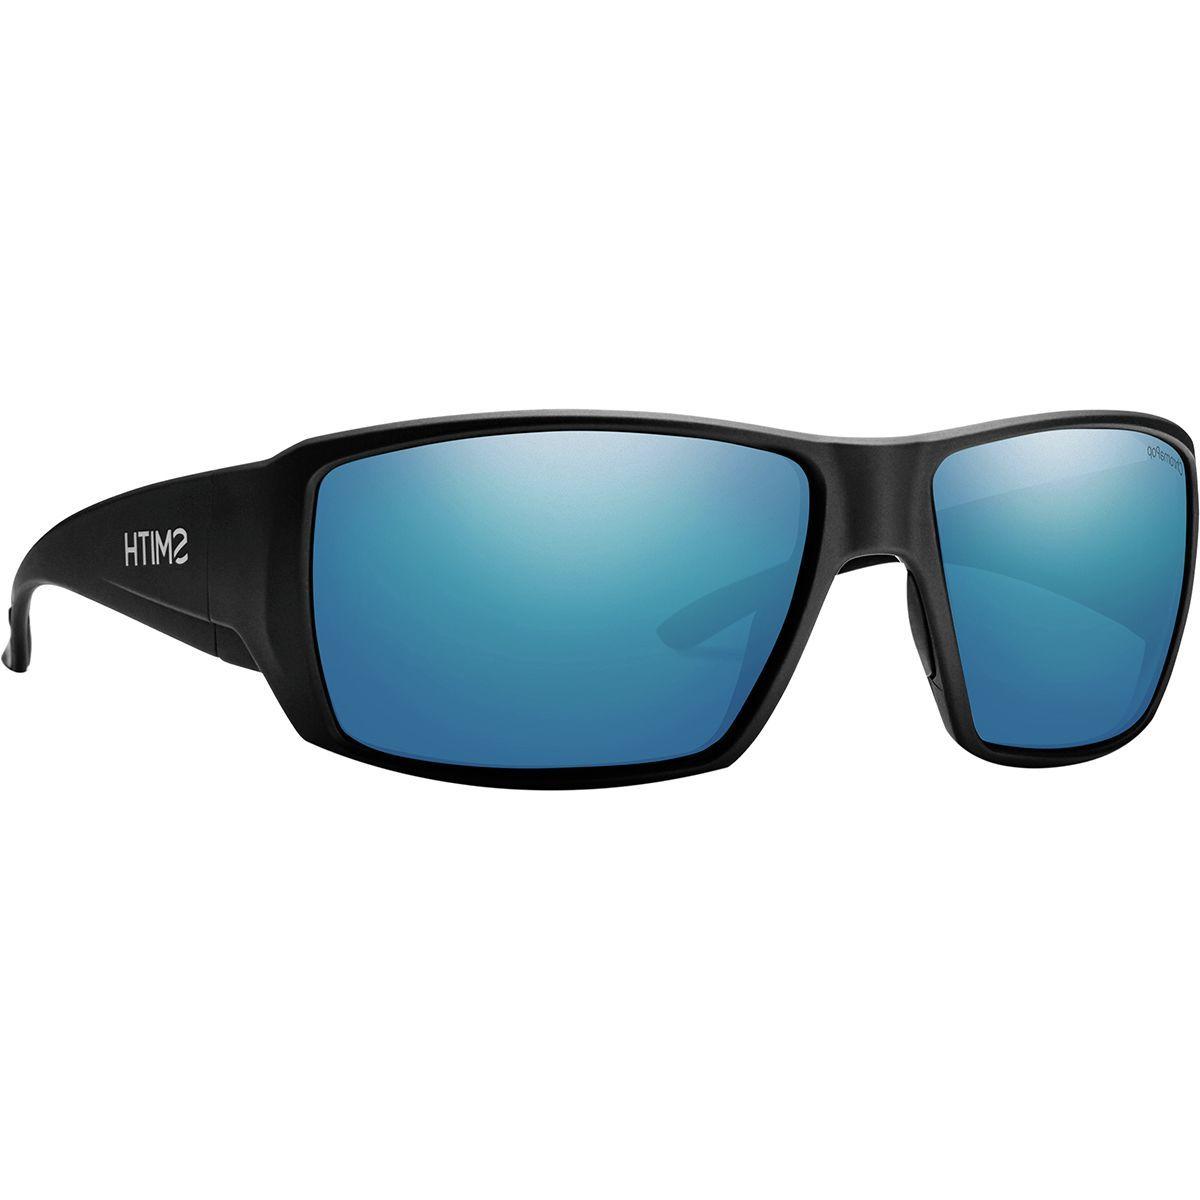 Smith Guide's Choice ChromaPop Glass Polarized Sunglasses - Men's